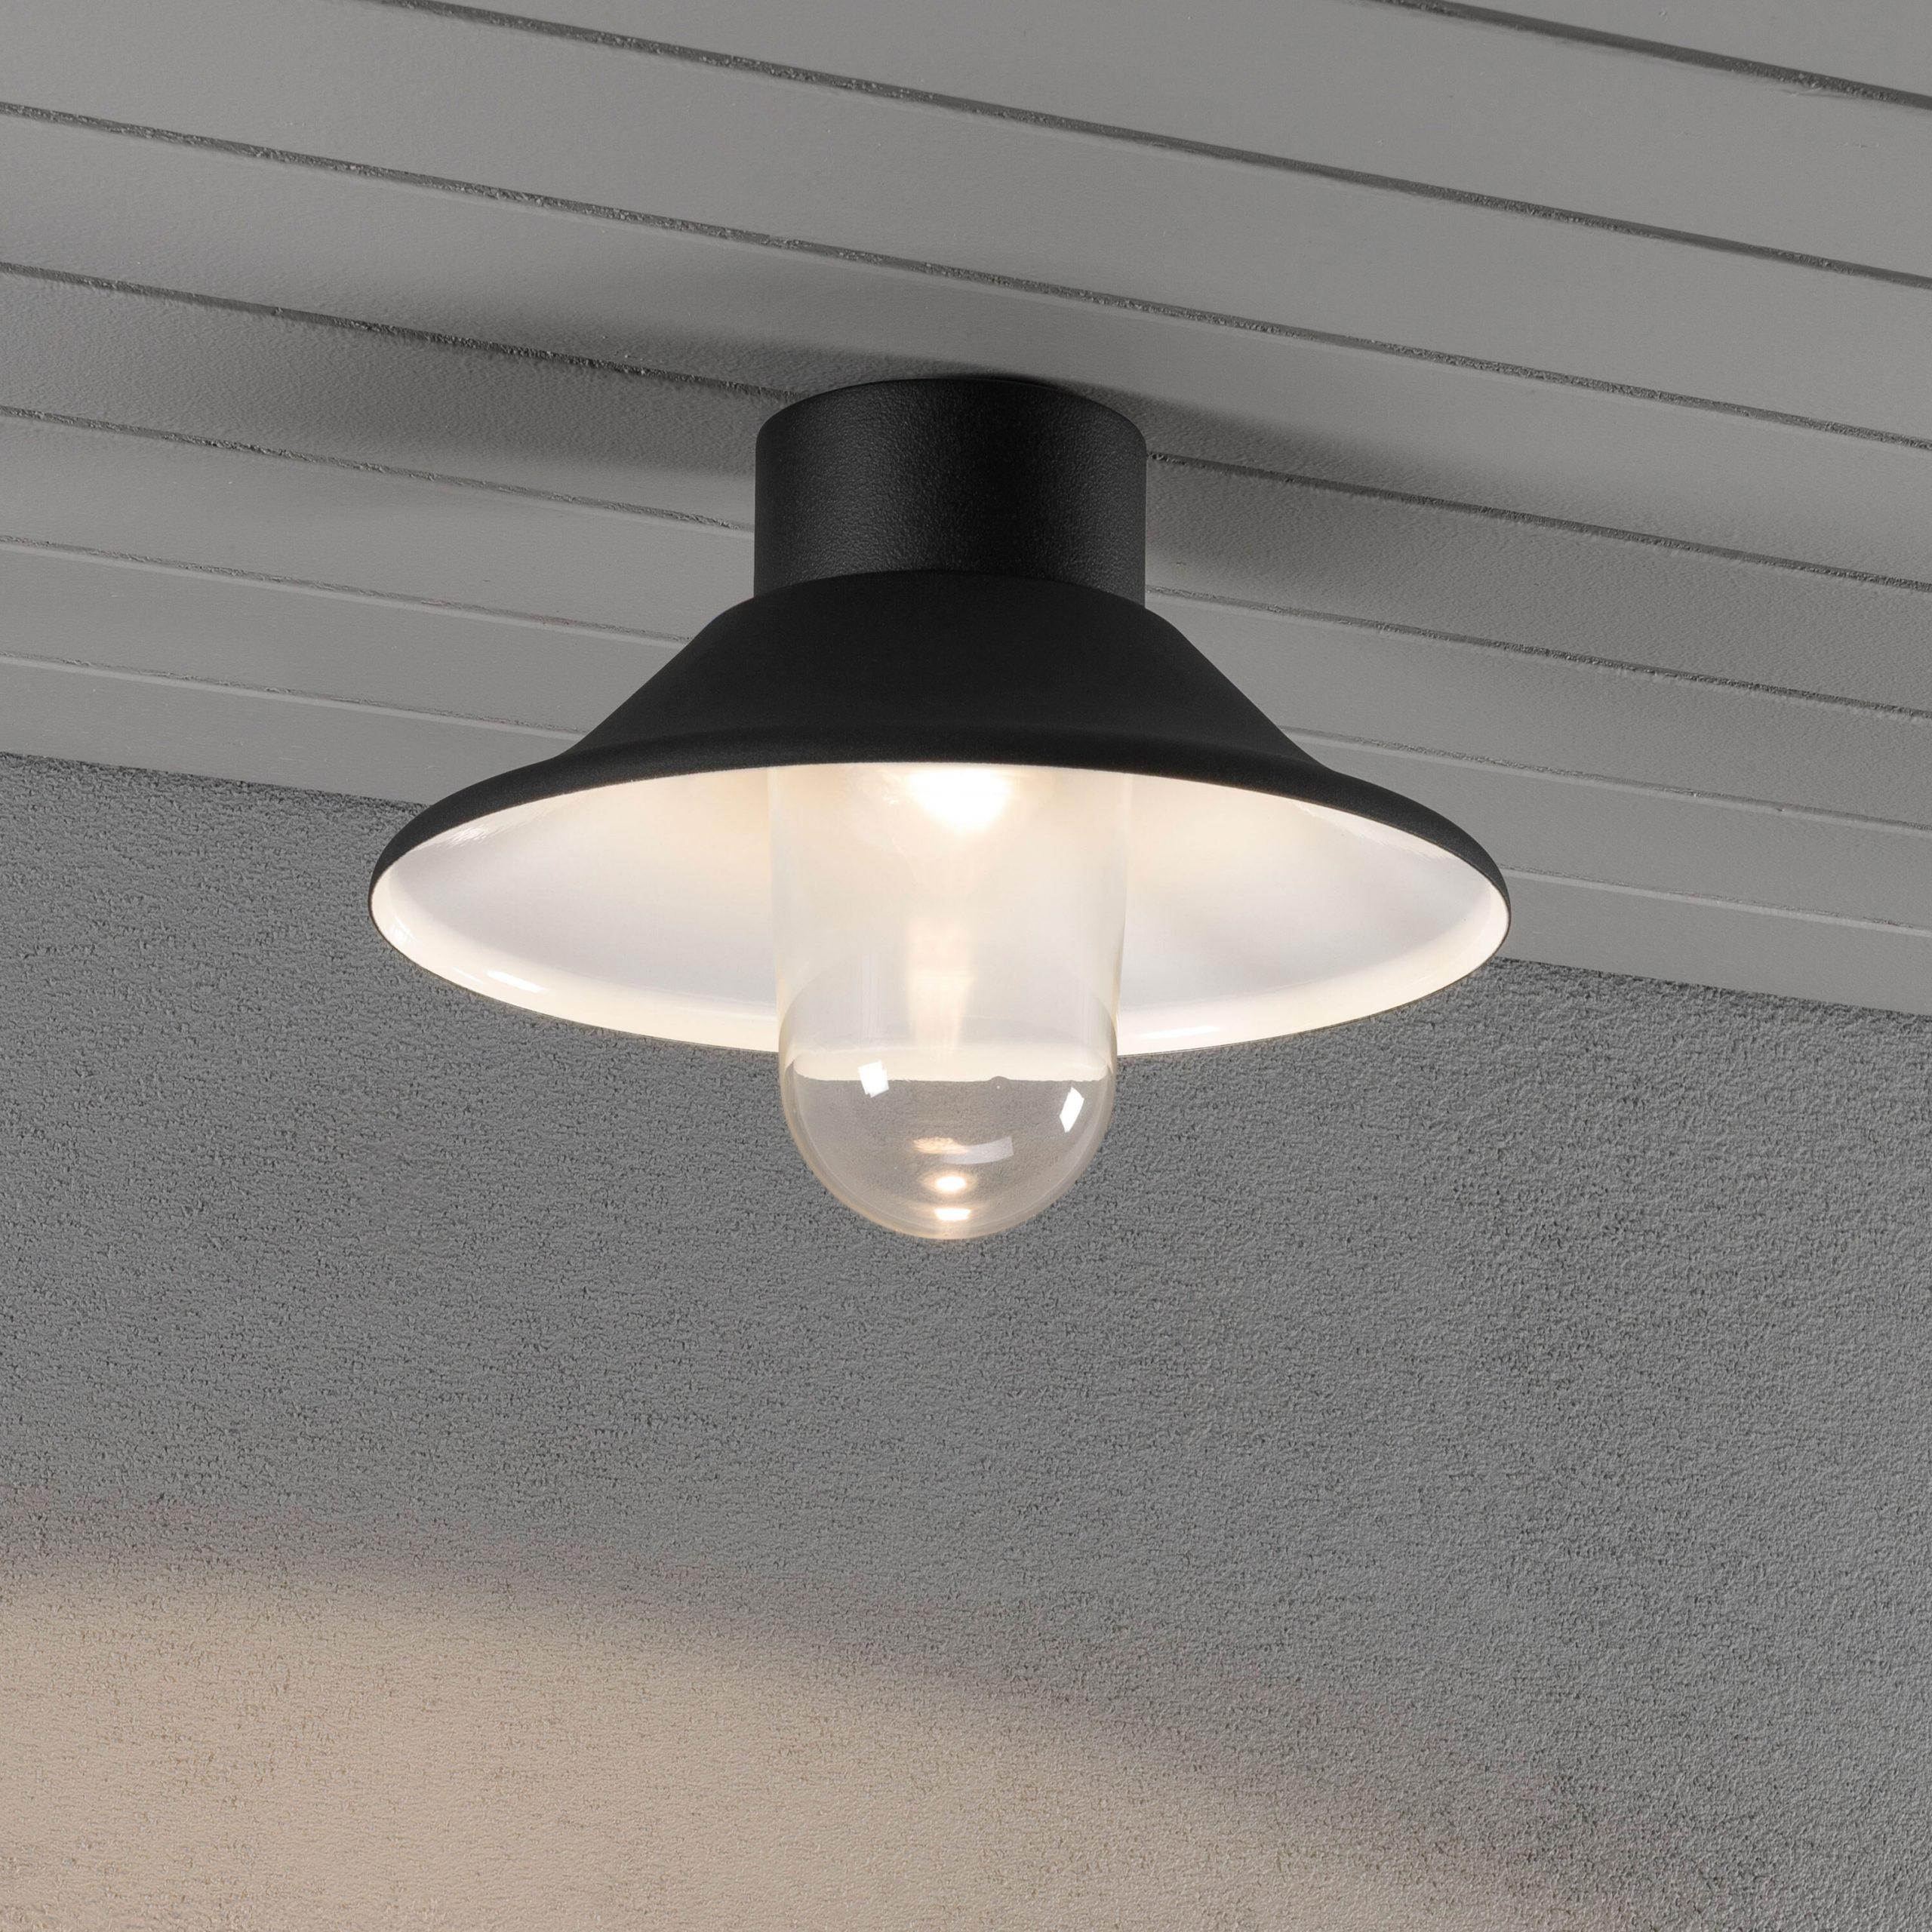 Konstsmide Buitenlamp 'Vega' Plafonnière, PowerLED 1 x 8W / 230V, kleur zwart | Konstsmide